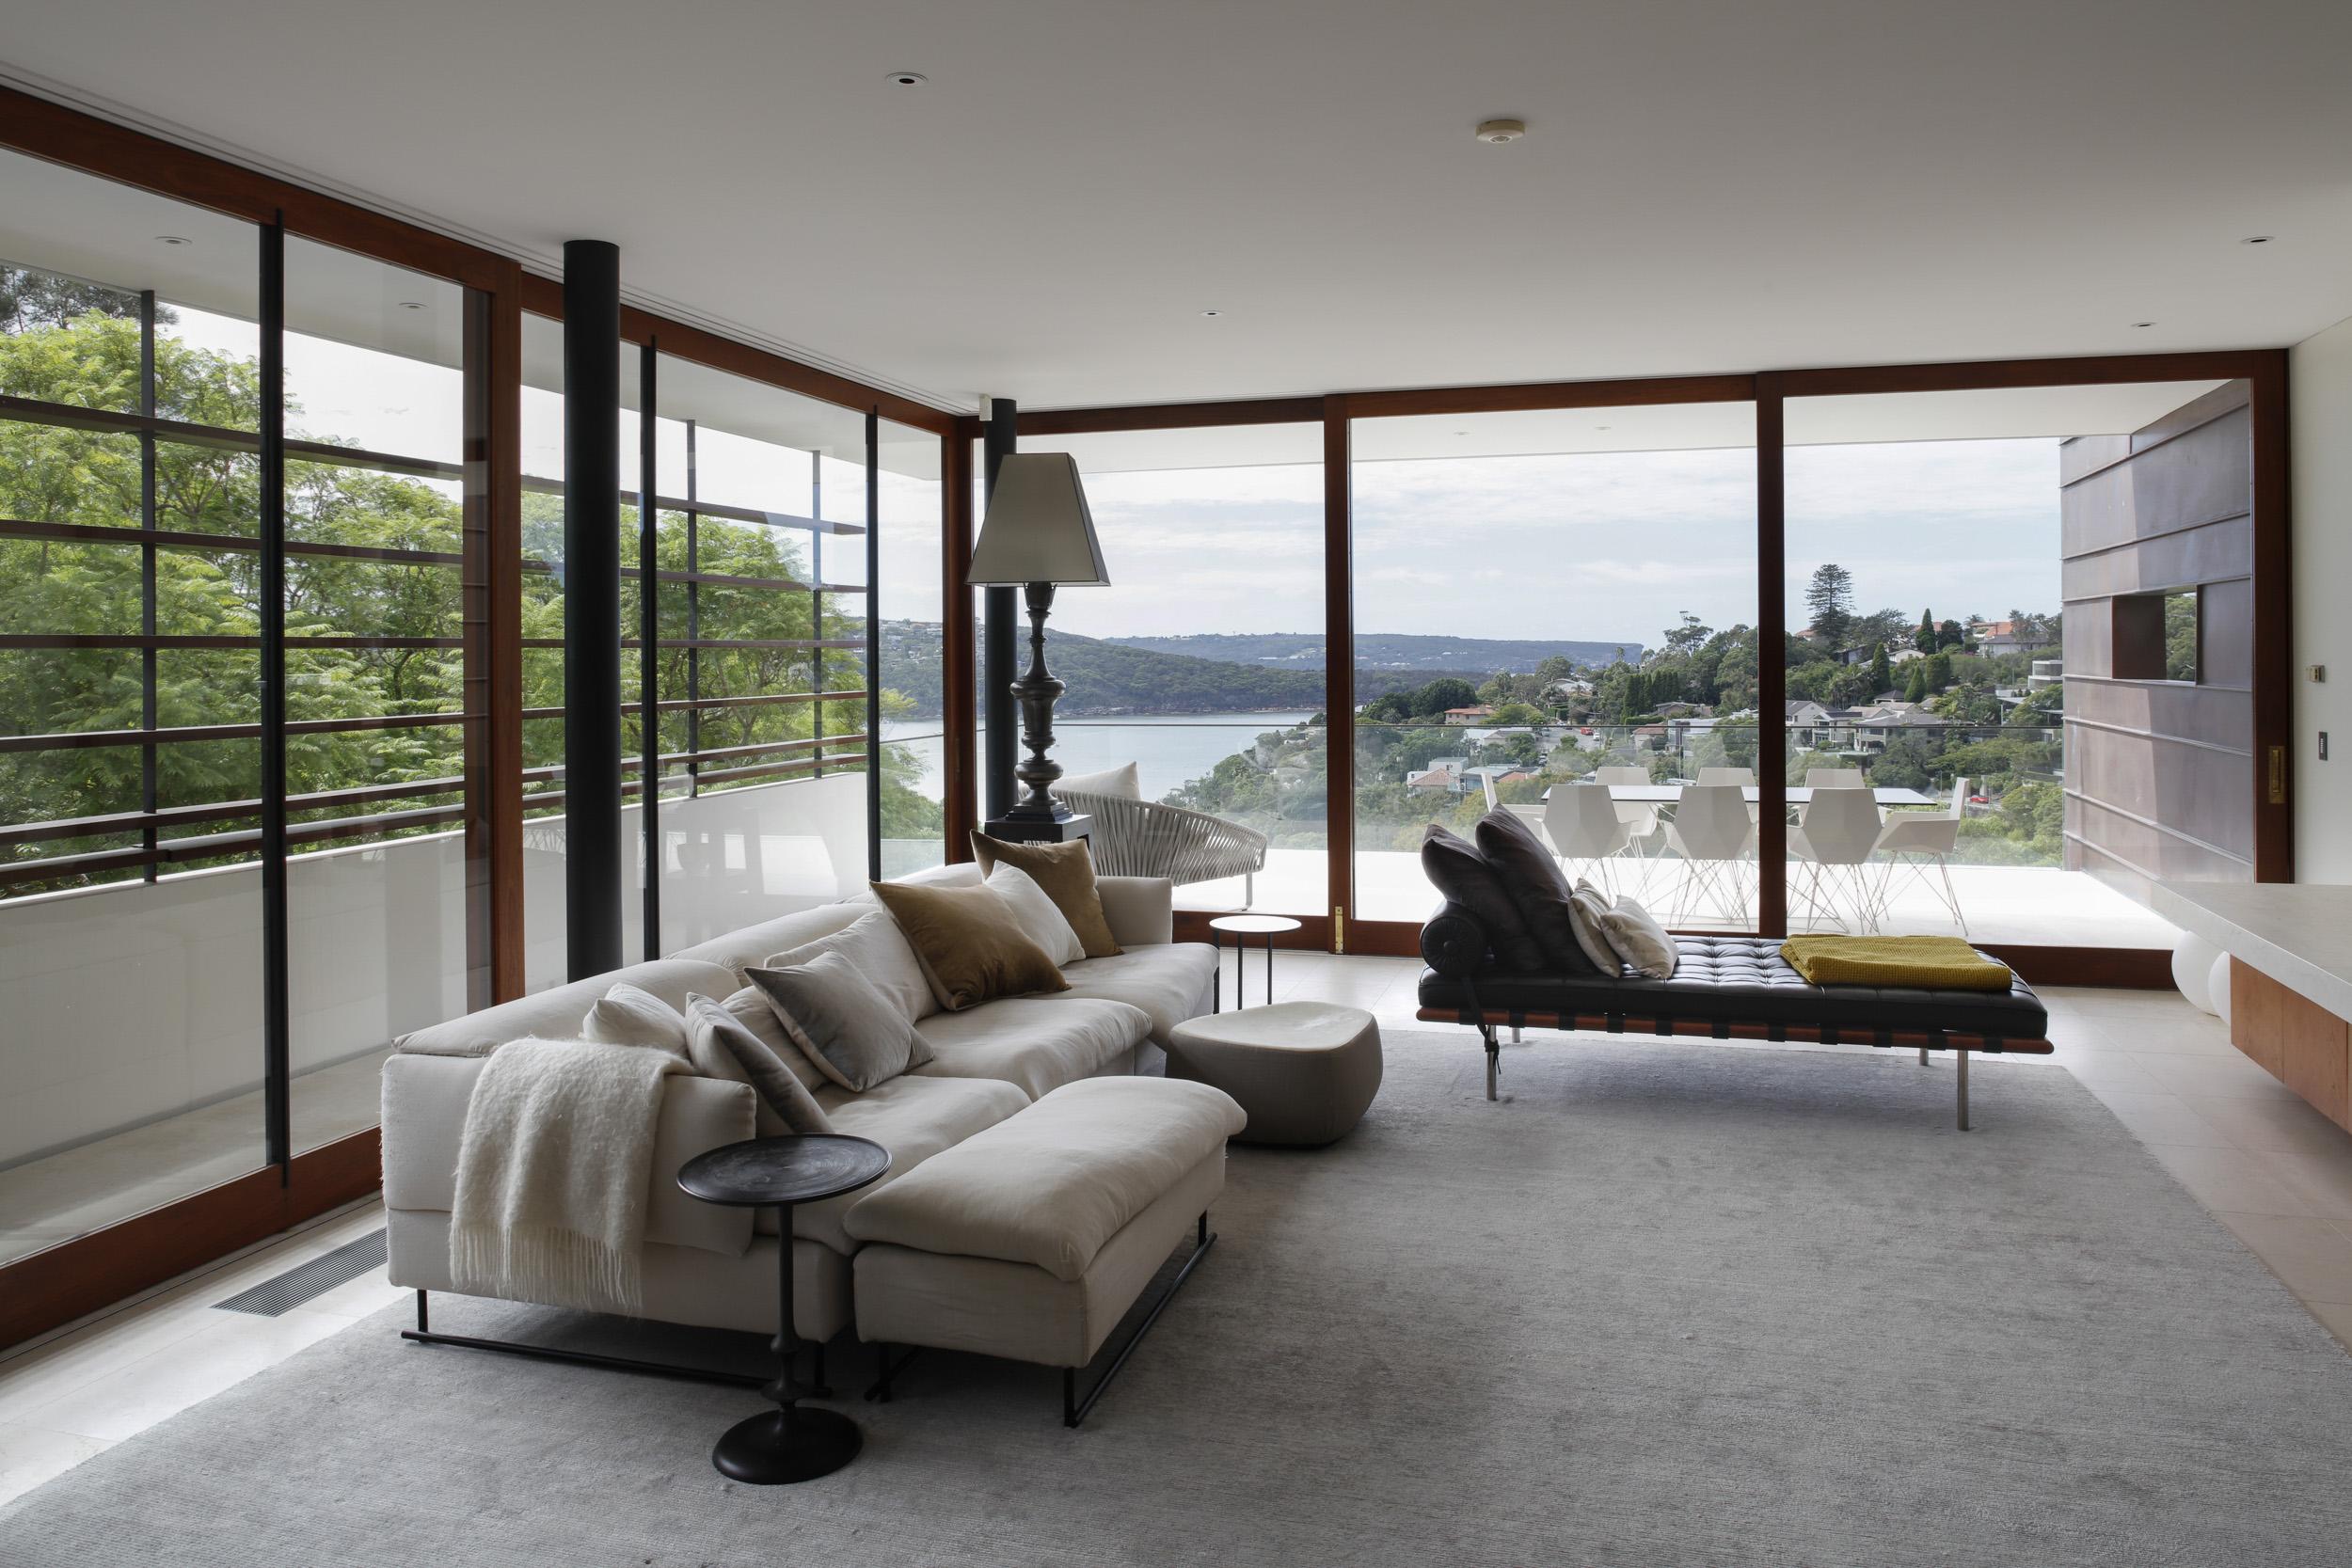 residential_architect_photographer_sydney_26.jpg